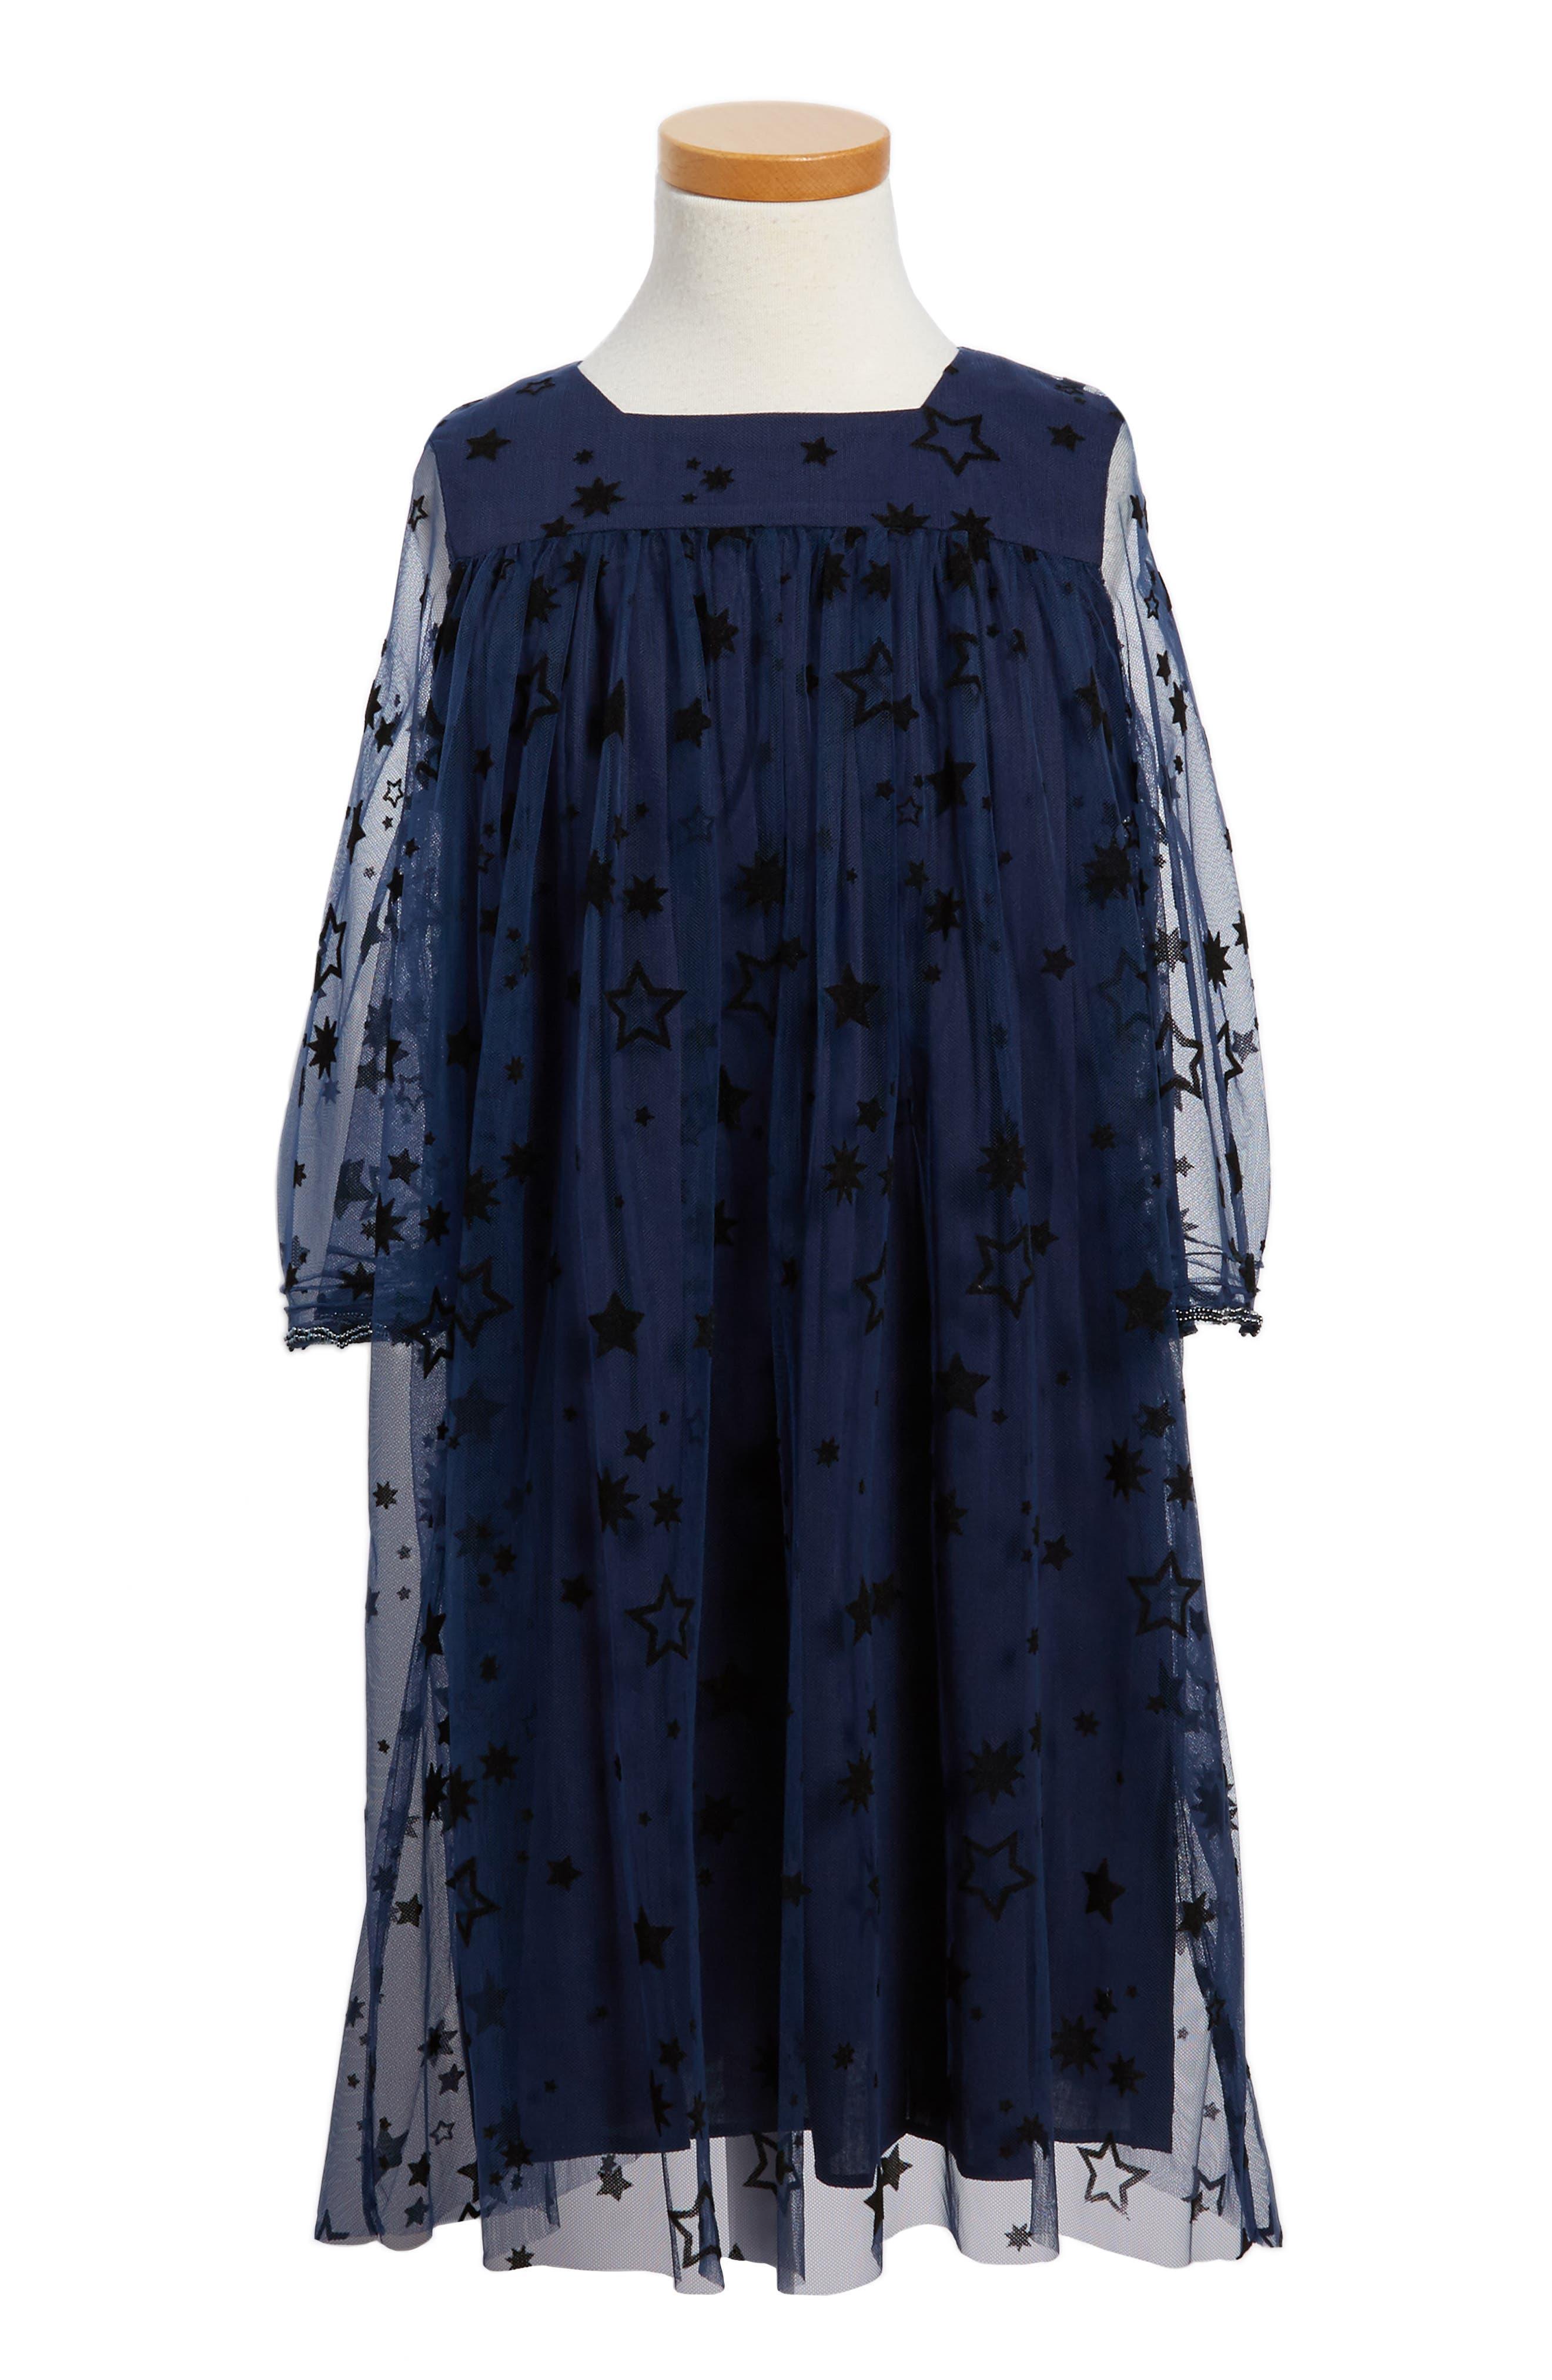 Zodiac Dress,                             Main thumbnail 1, color,                             410